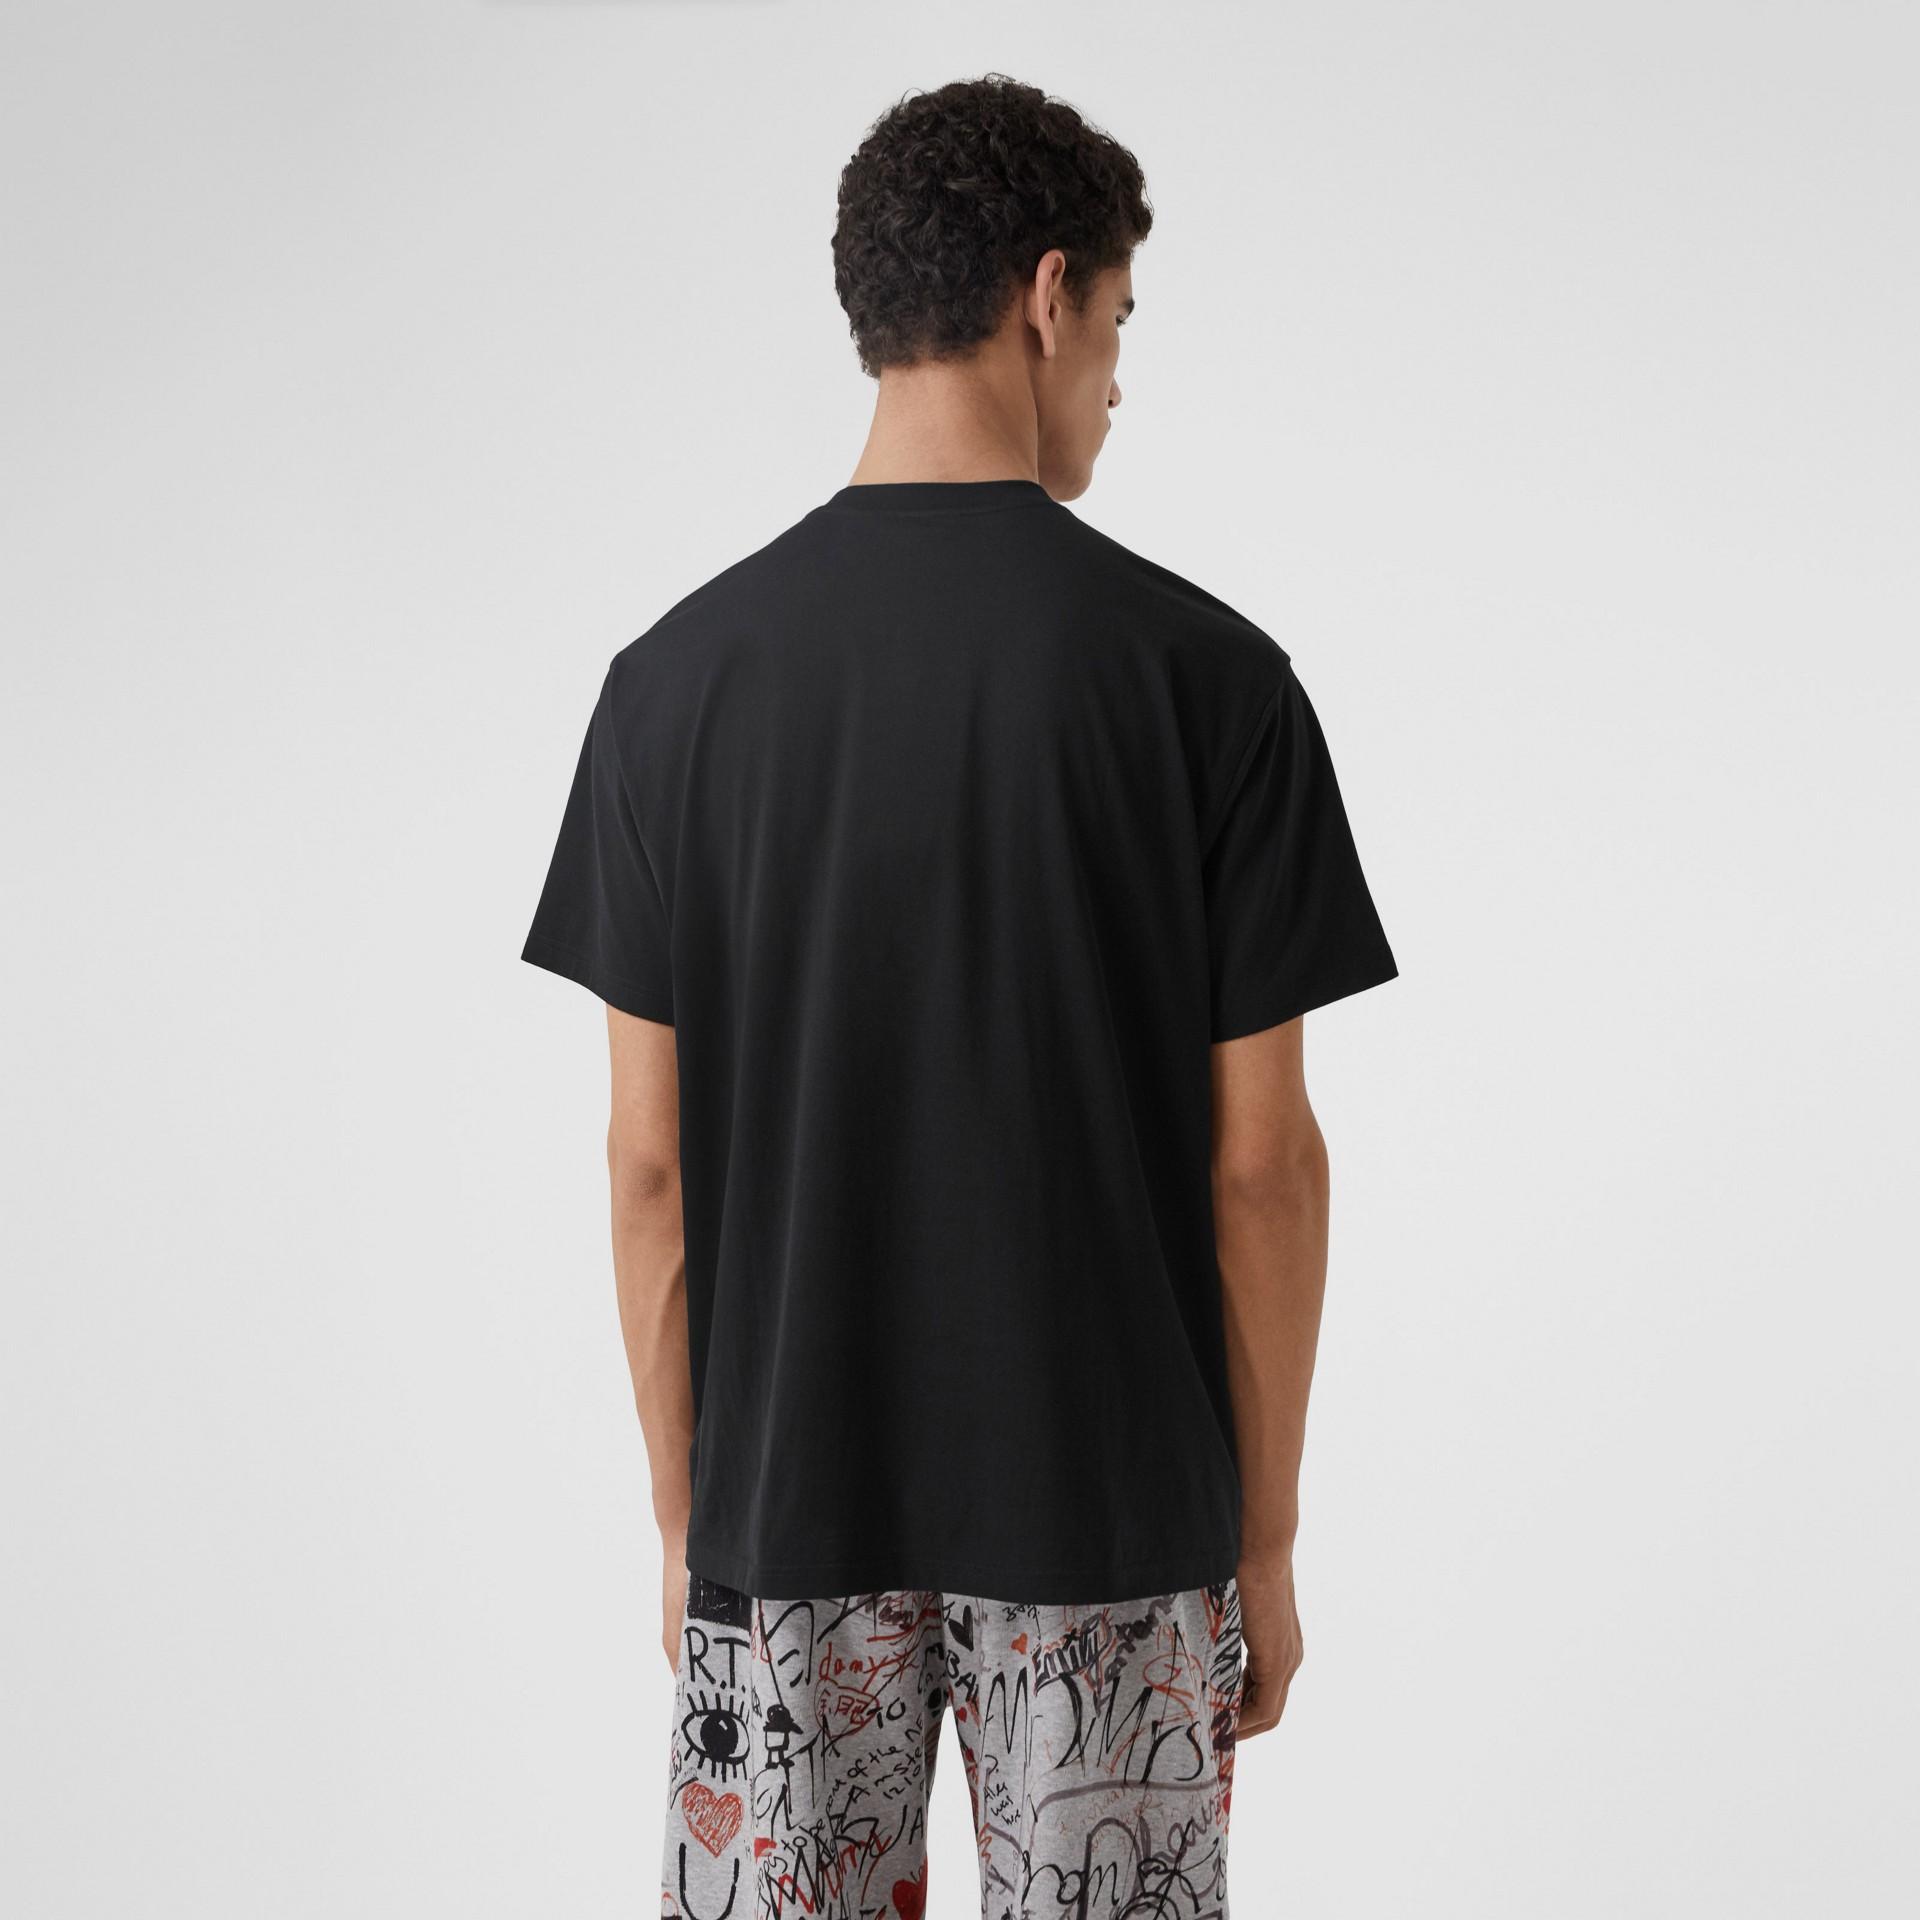 Monogram Motif Cotton Oversized T-shirt in Black - Men | Burberry United Kingdom - gallery image 2